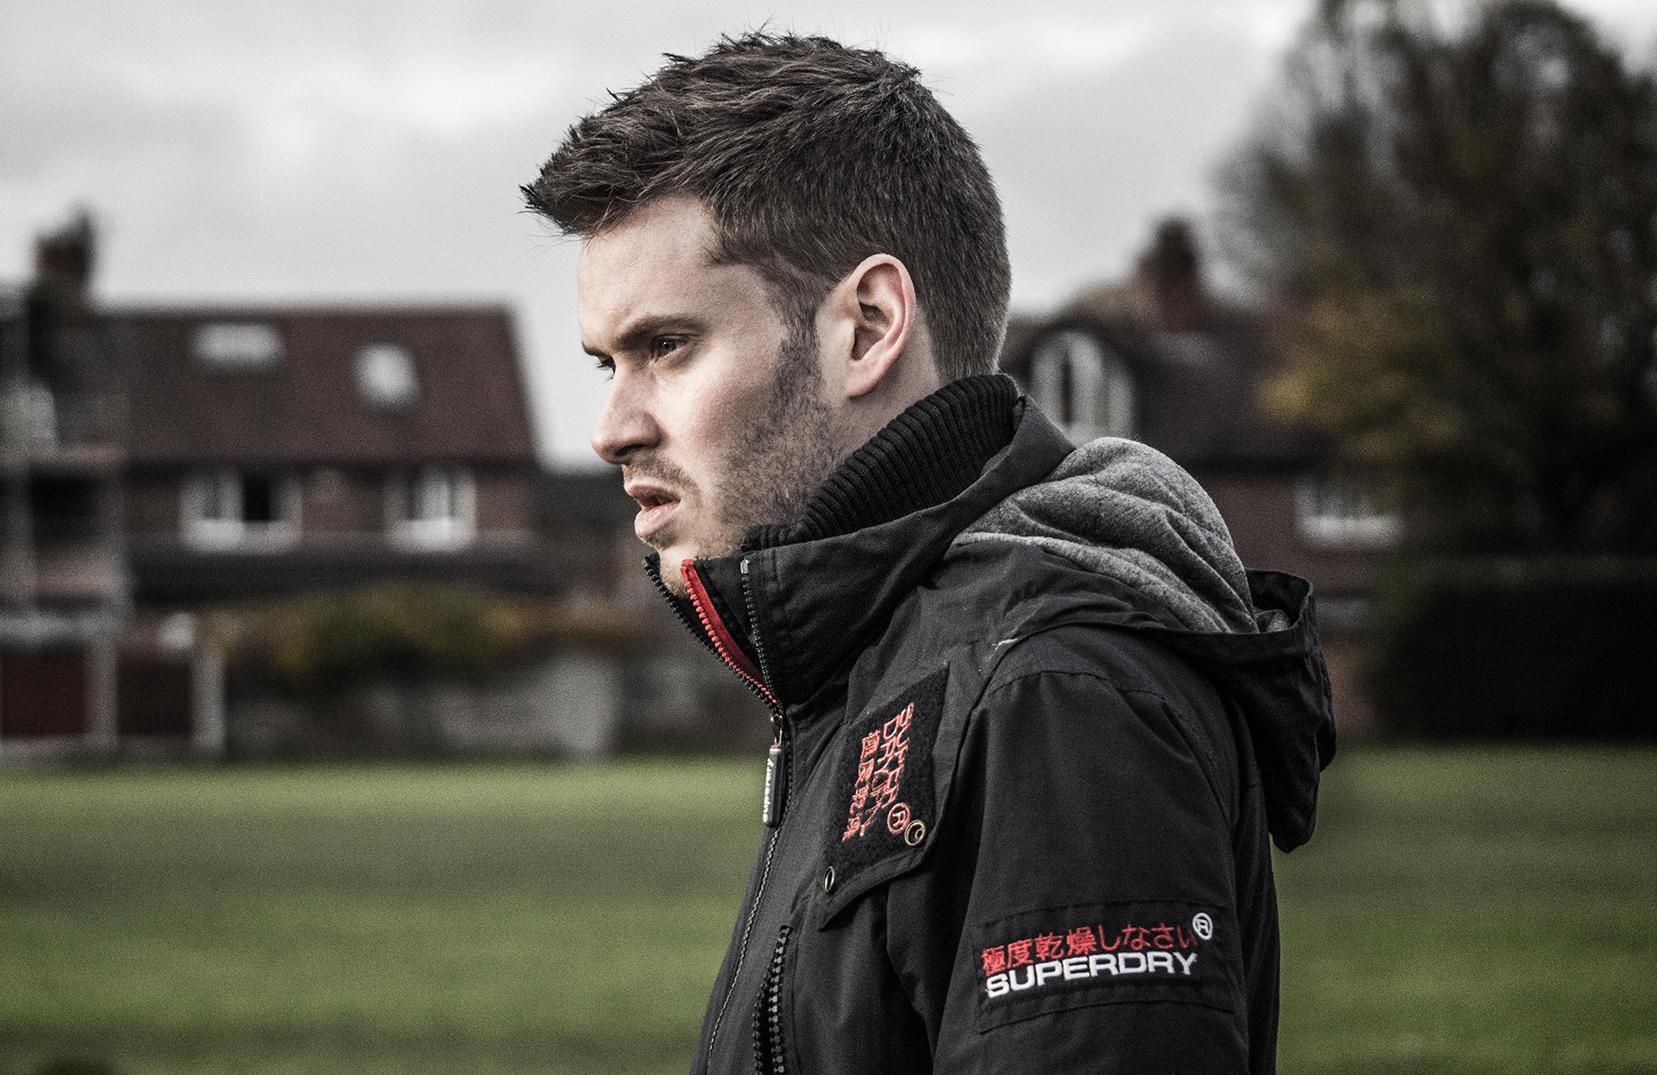 Ben Dawson - Manchester Village Spartans - Inclusive Rugby - Gay Rugby